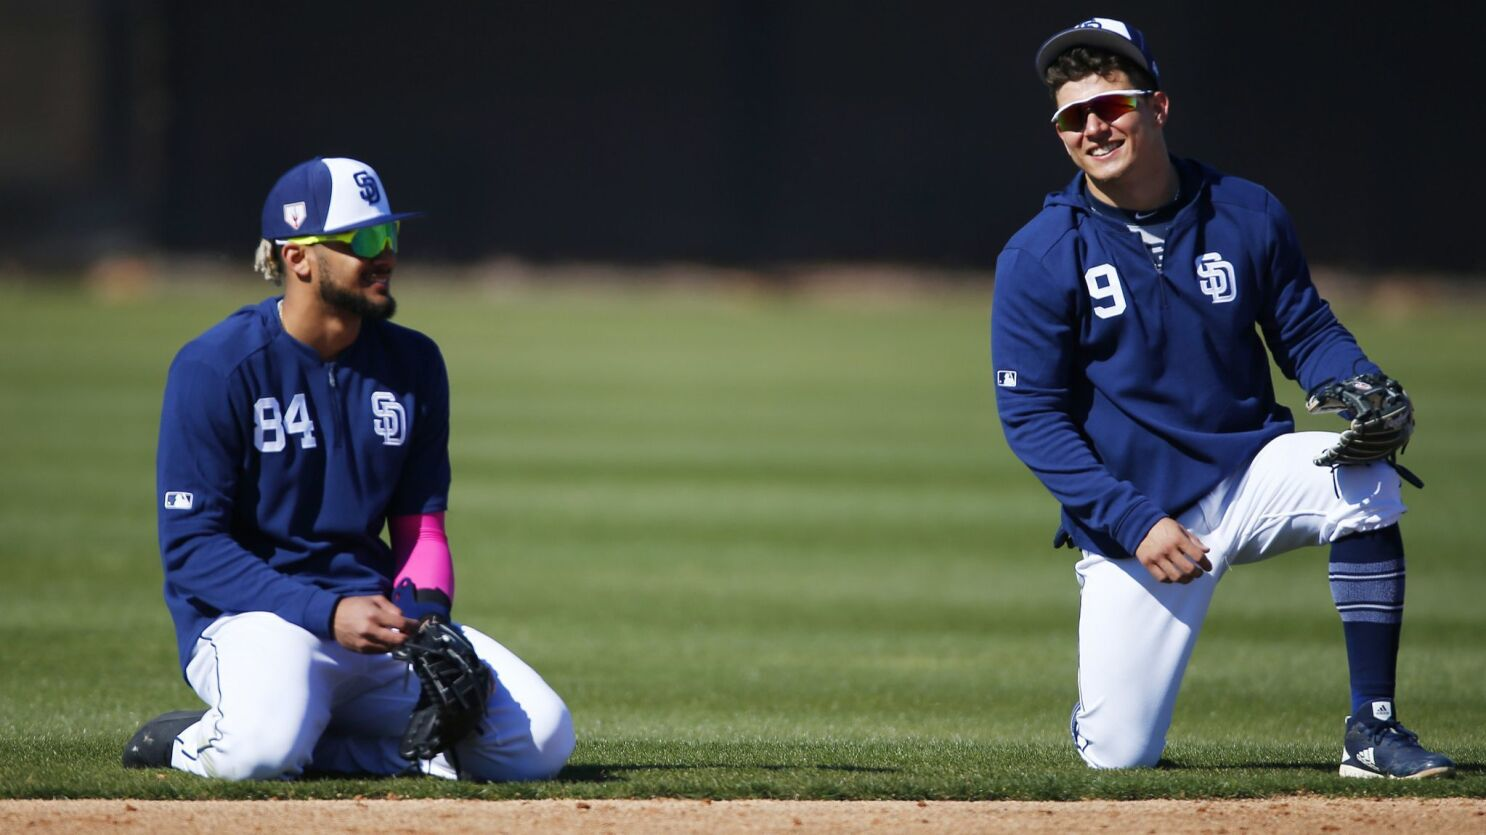 e8e2b50dfe33b8 Minors: Padres atop MLB.com farm system rankings - The San Diego  Union-Tribune